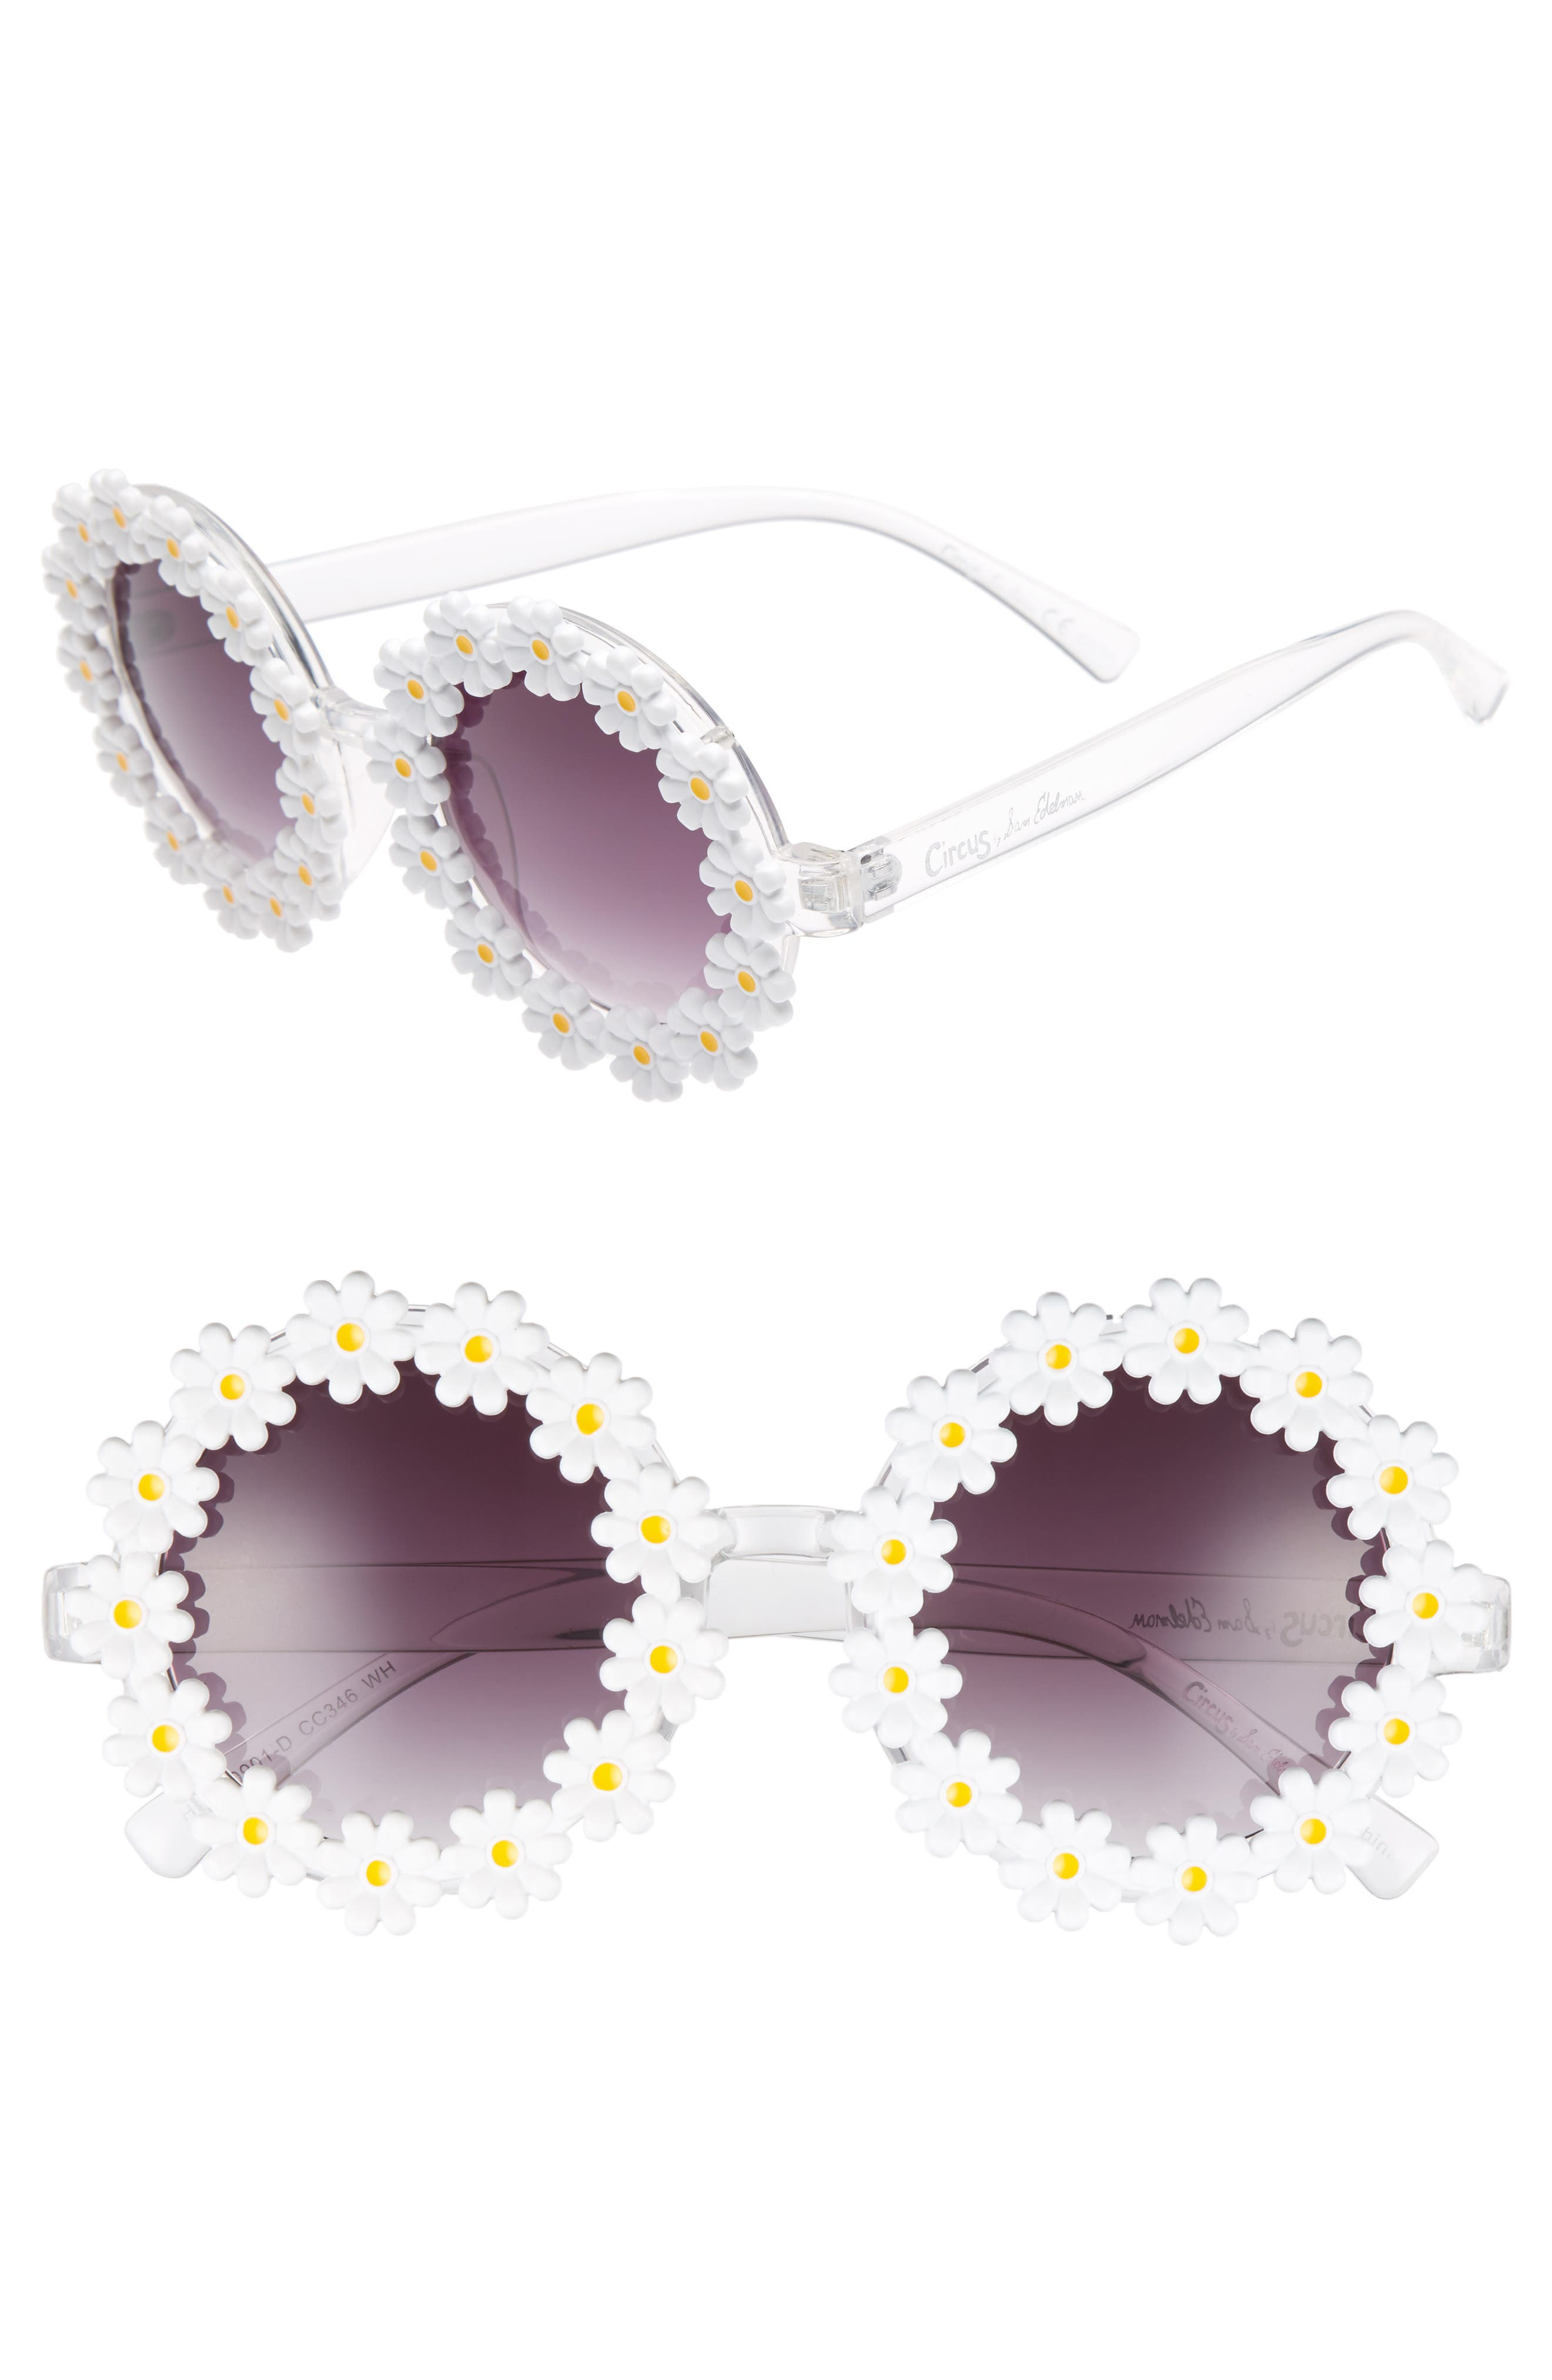 45mm Round Sunglasses,                             Main thumbnail 1, color,                             White